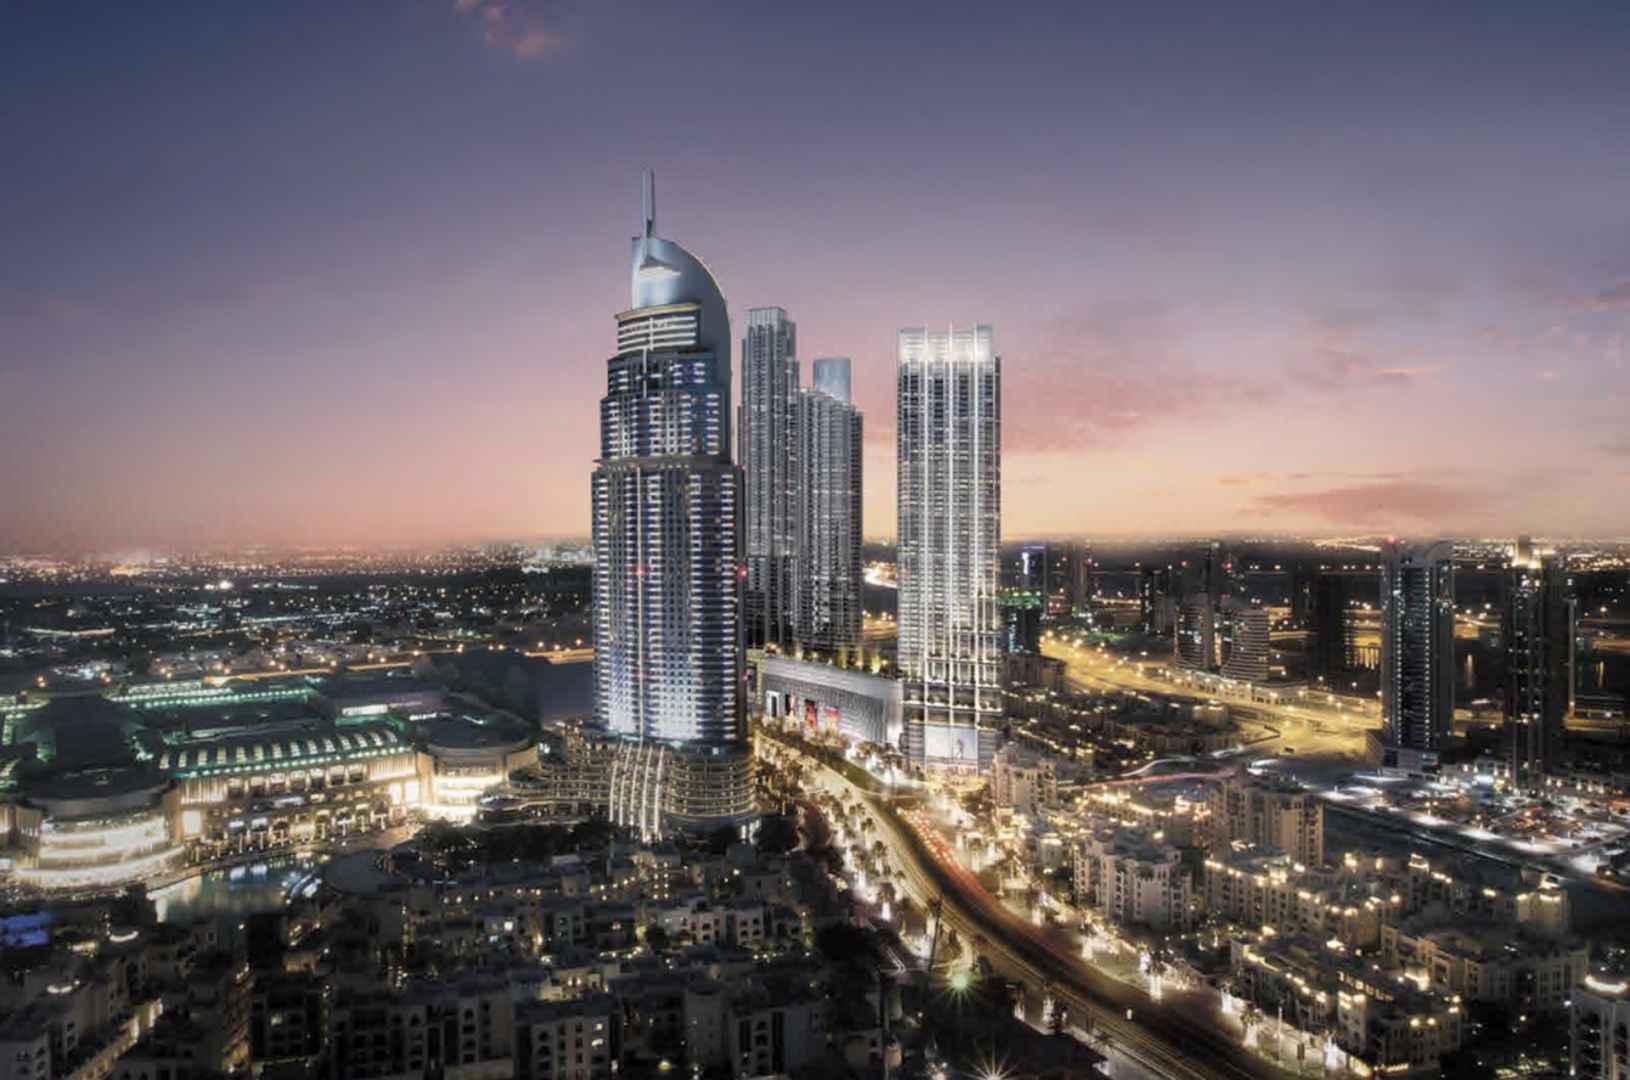 Luxury Property Dubai 3 Bedroom Apartment for sale in Boulevard Point Downtown Dubai